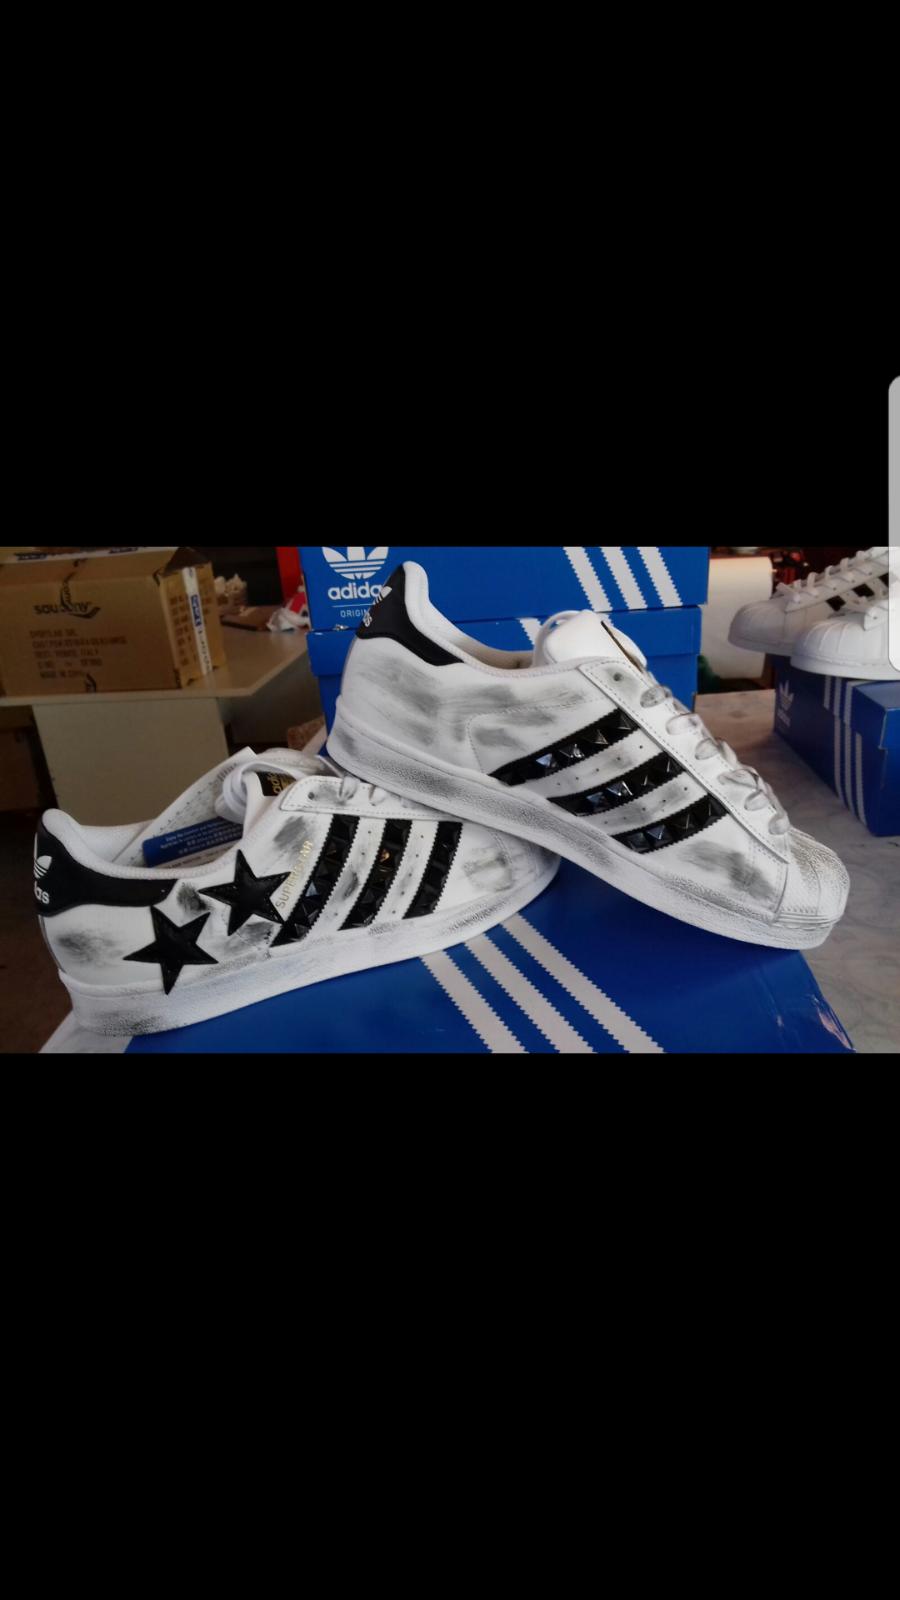 zapatos adidas borchie superstar con stelle e borchie adidas piu' sporcatura 10c03f